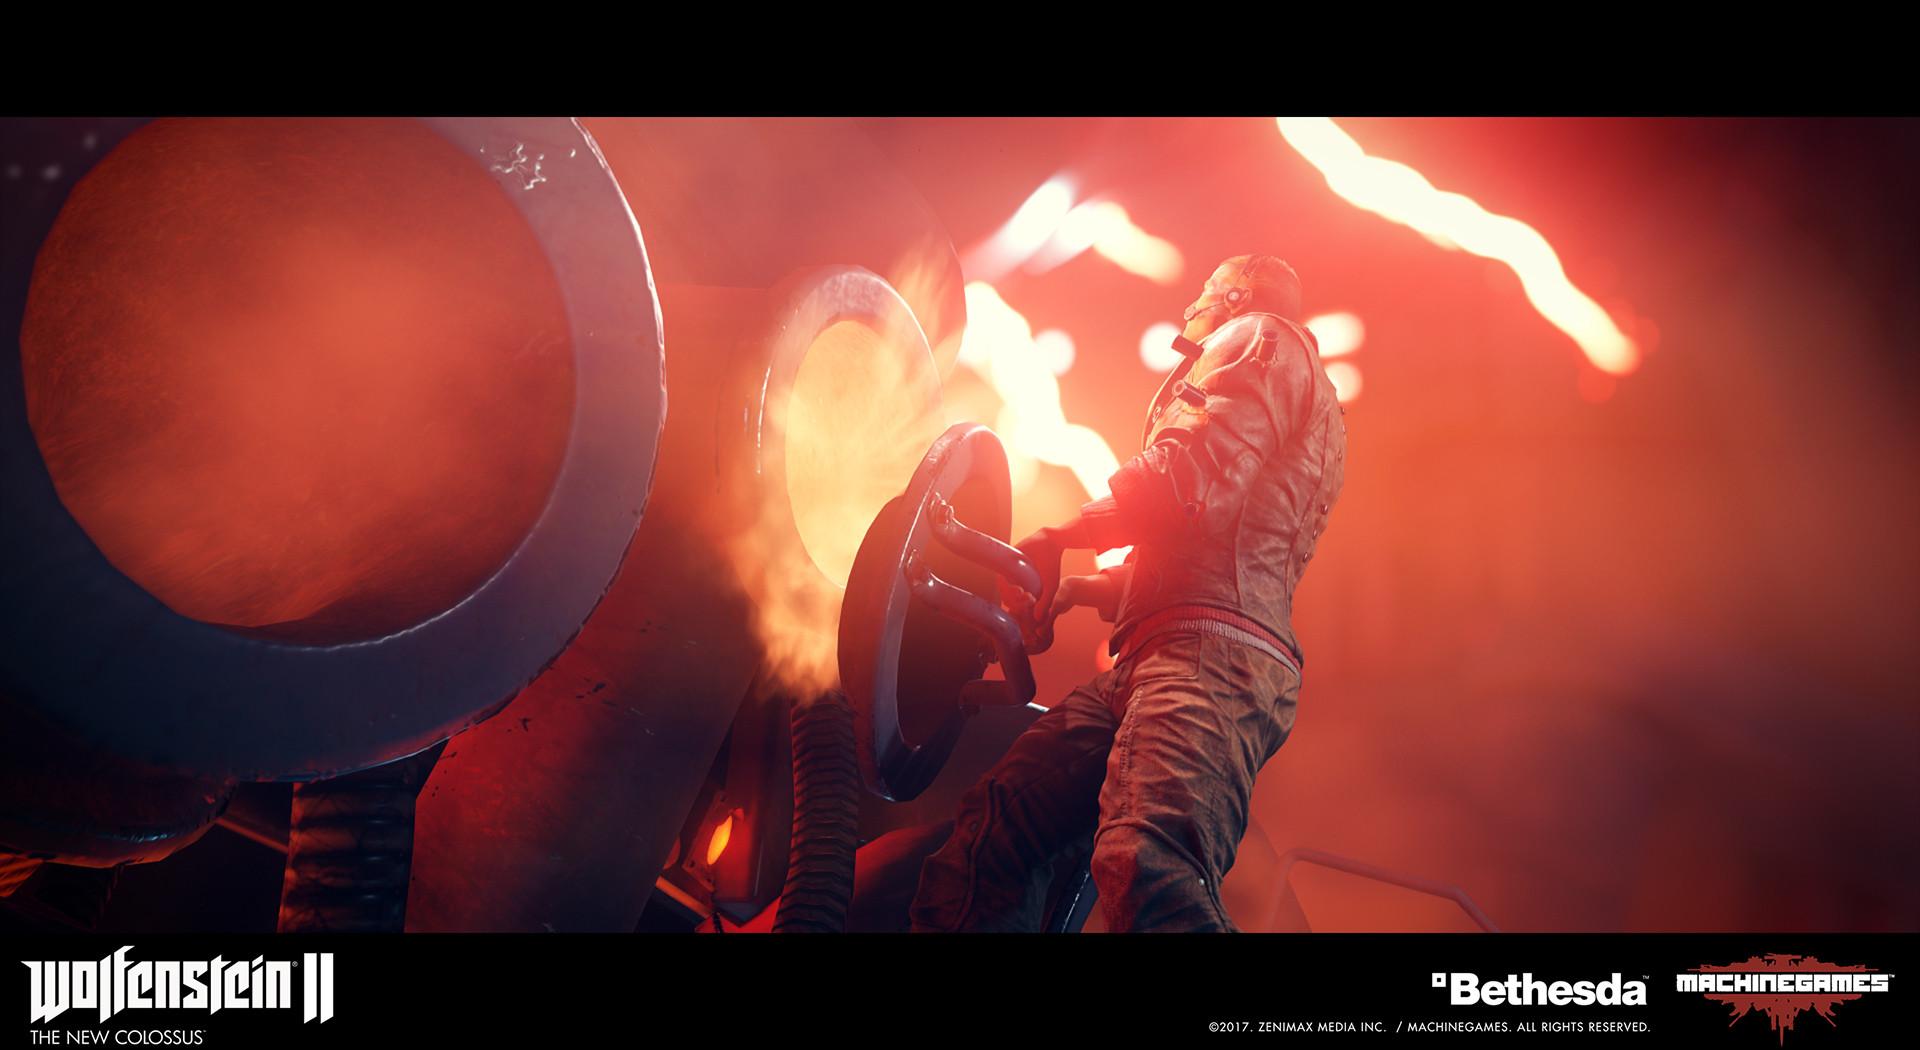 Vidar rapp reactor 01